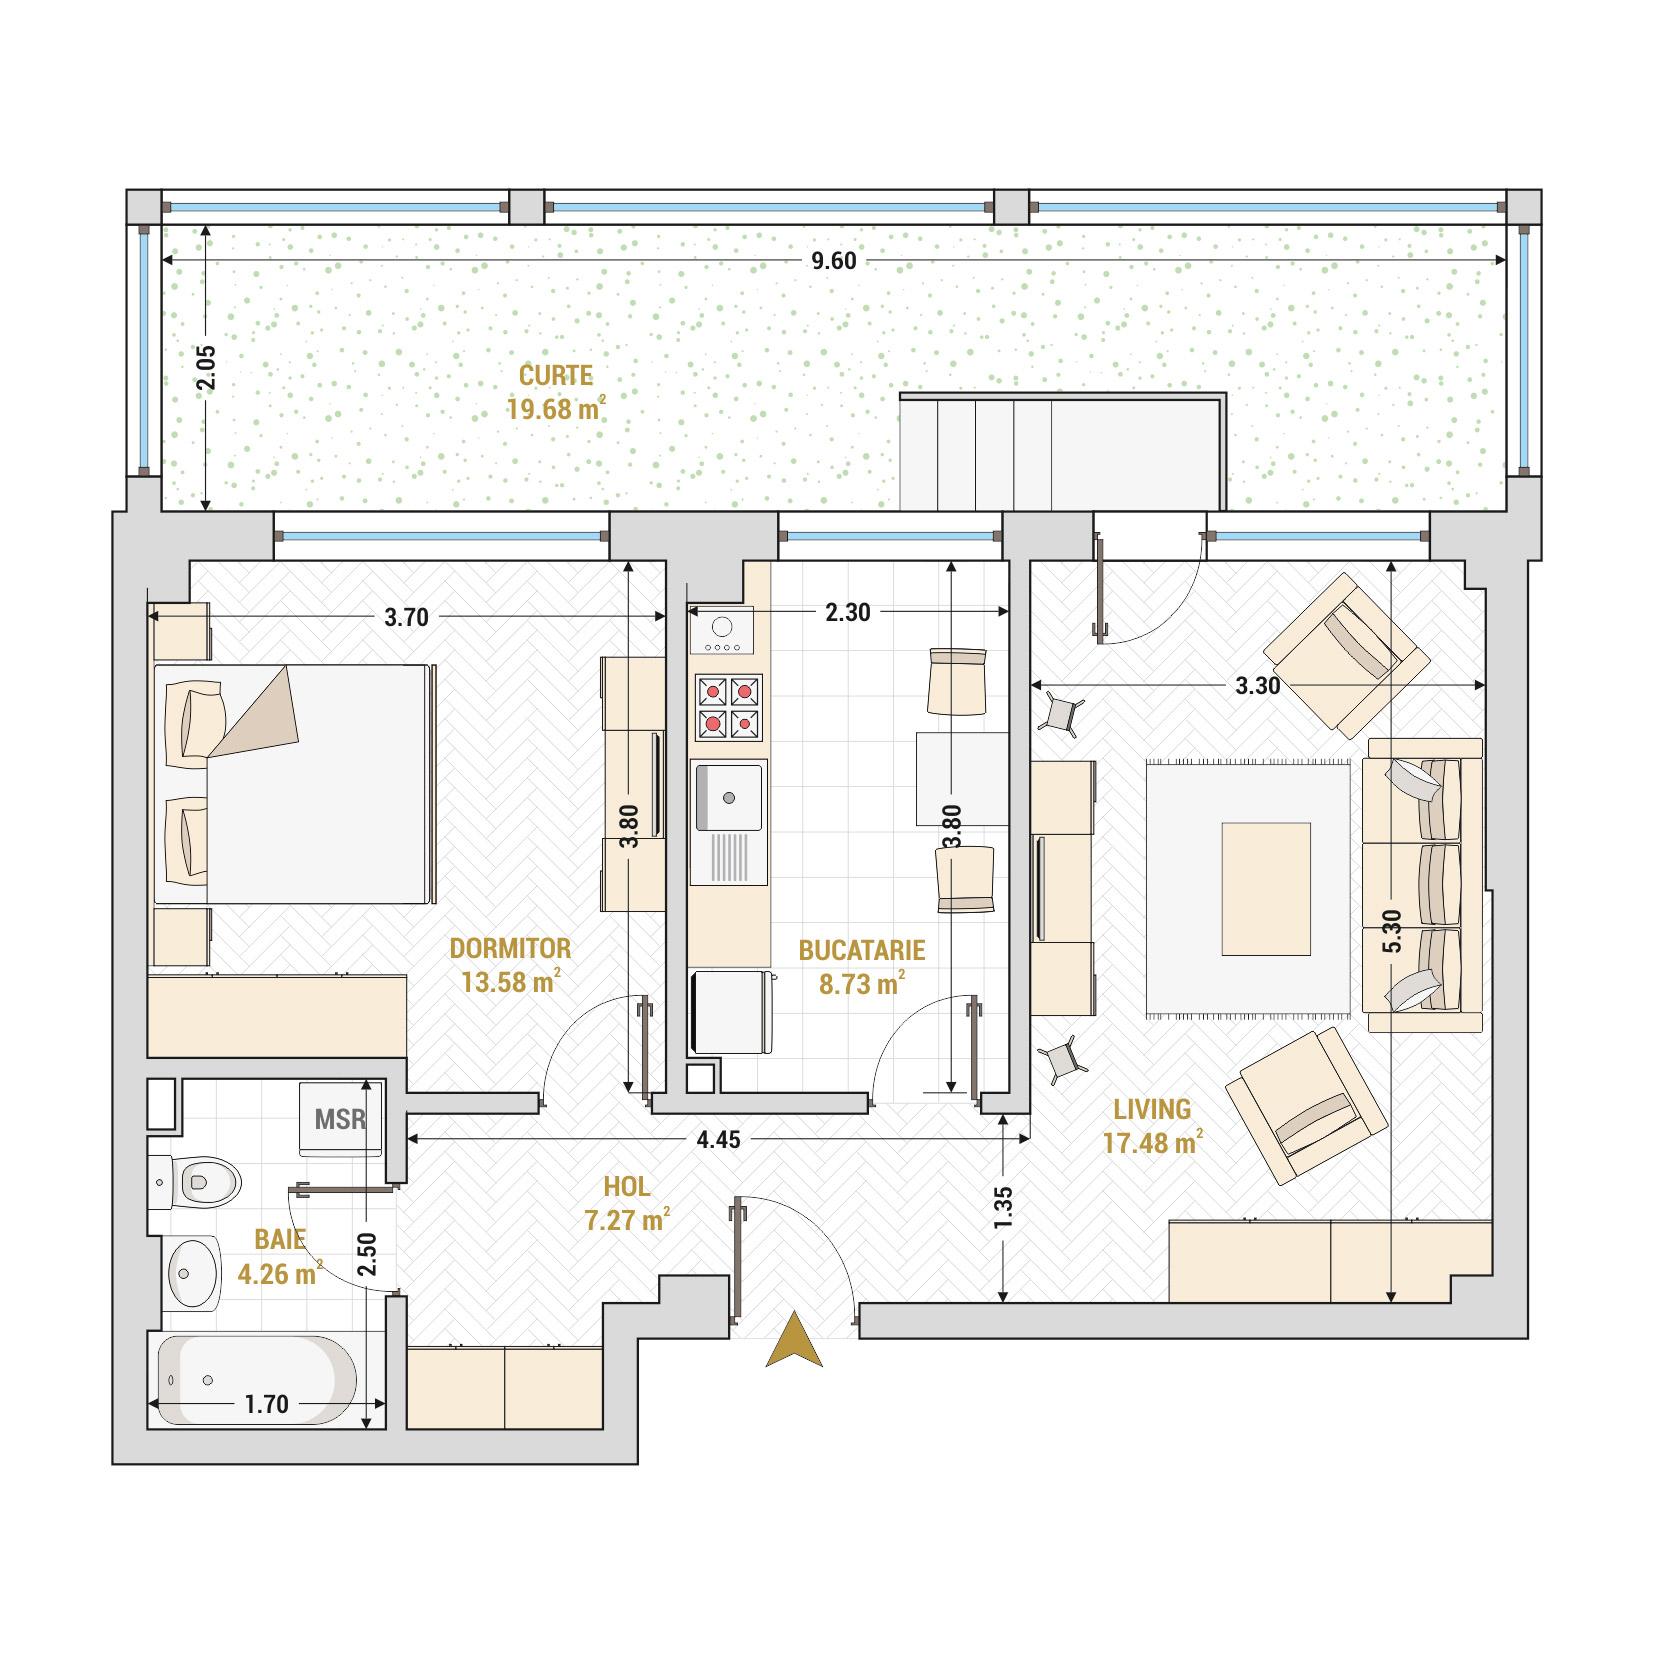 Apartament 2 camere de vanzare Bucuresti - Catedral Residence - Marriott, Piata Unirii, 13 Septembrie, Izvor - Tip 5 - T2